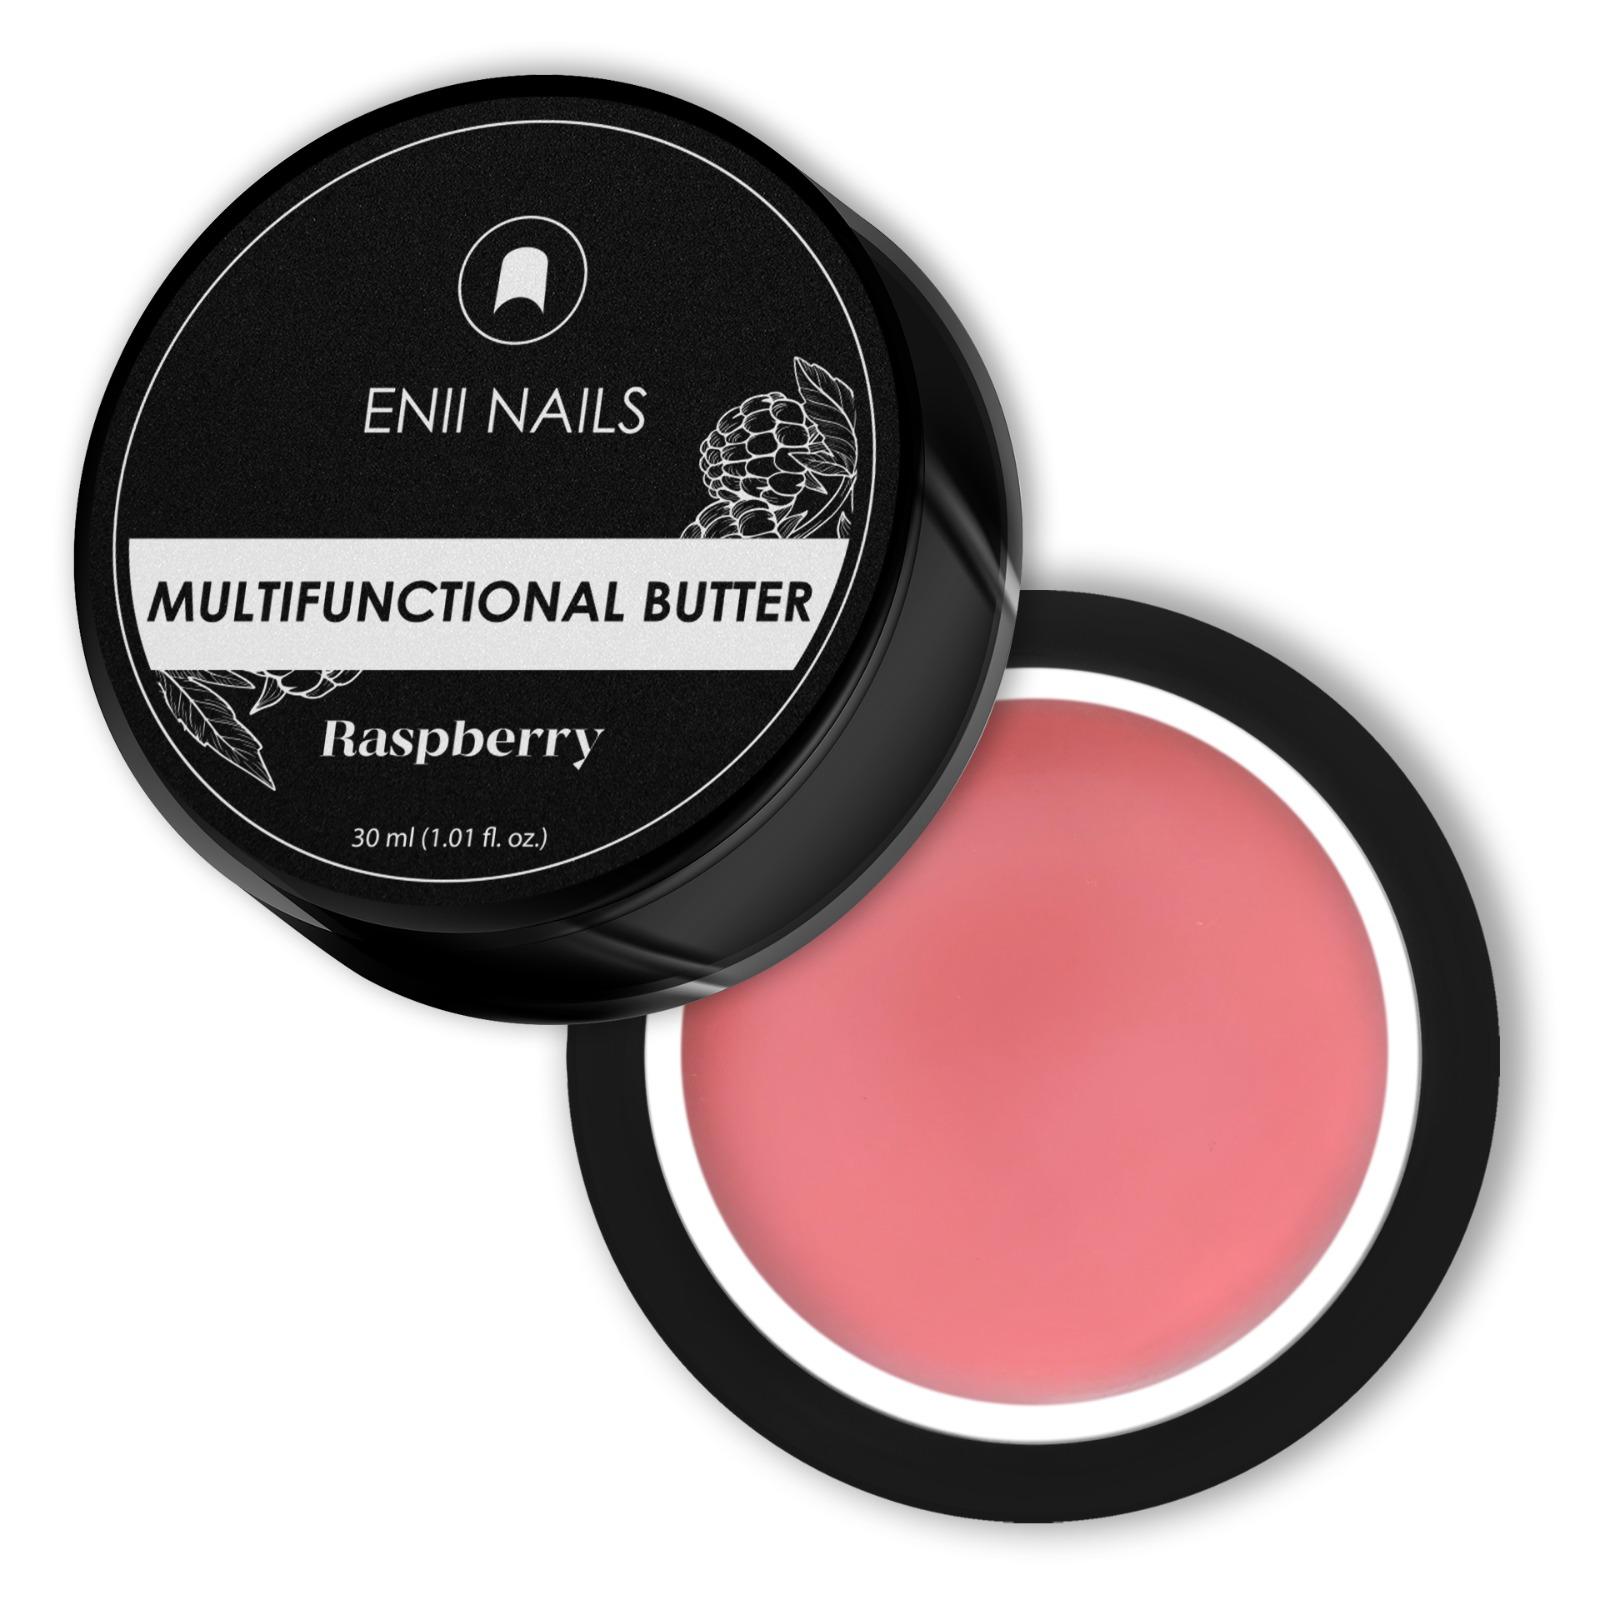 MULTI-FUNCTIONAL BUTTER - Raspberry